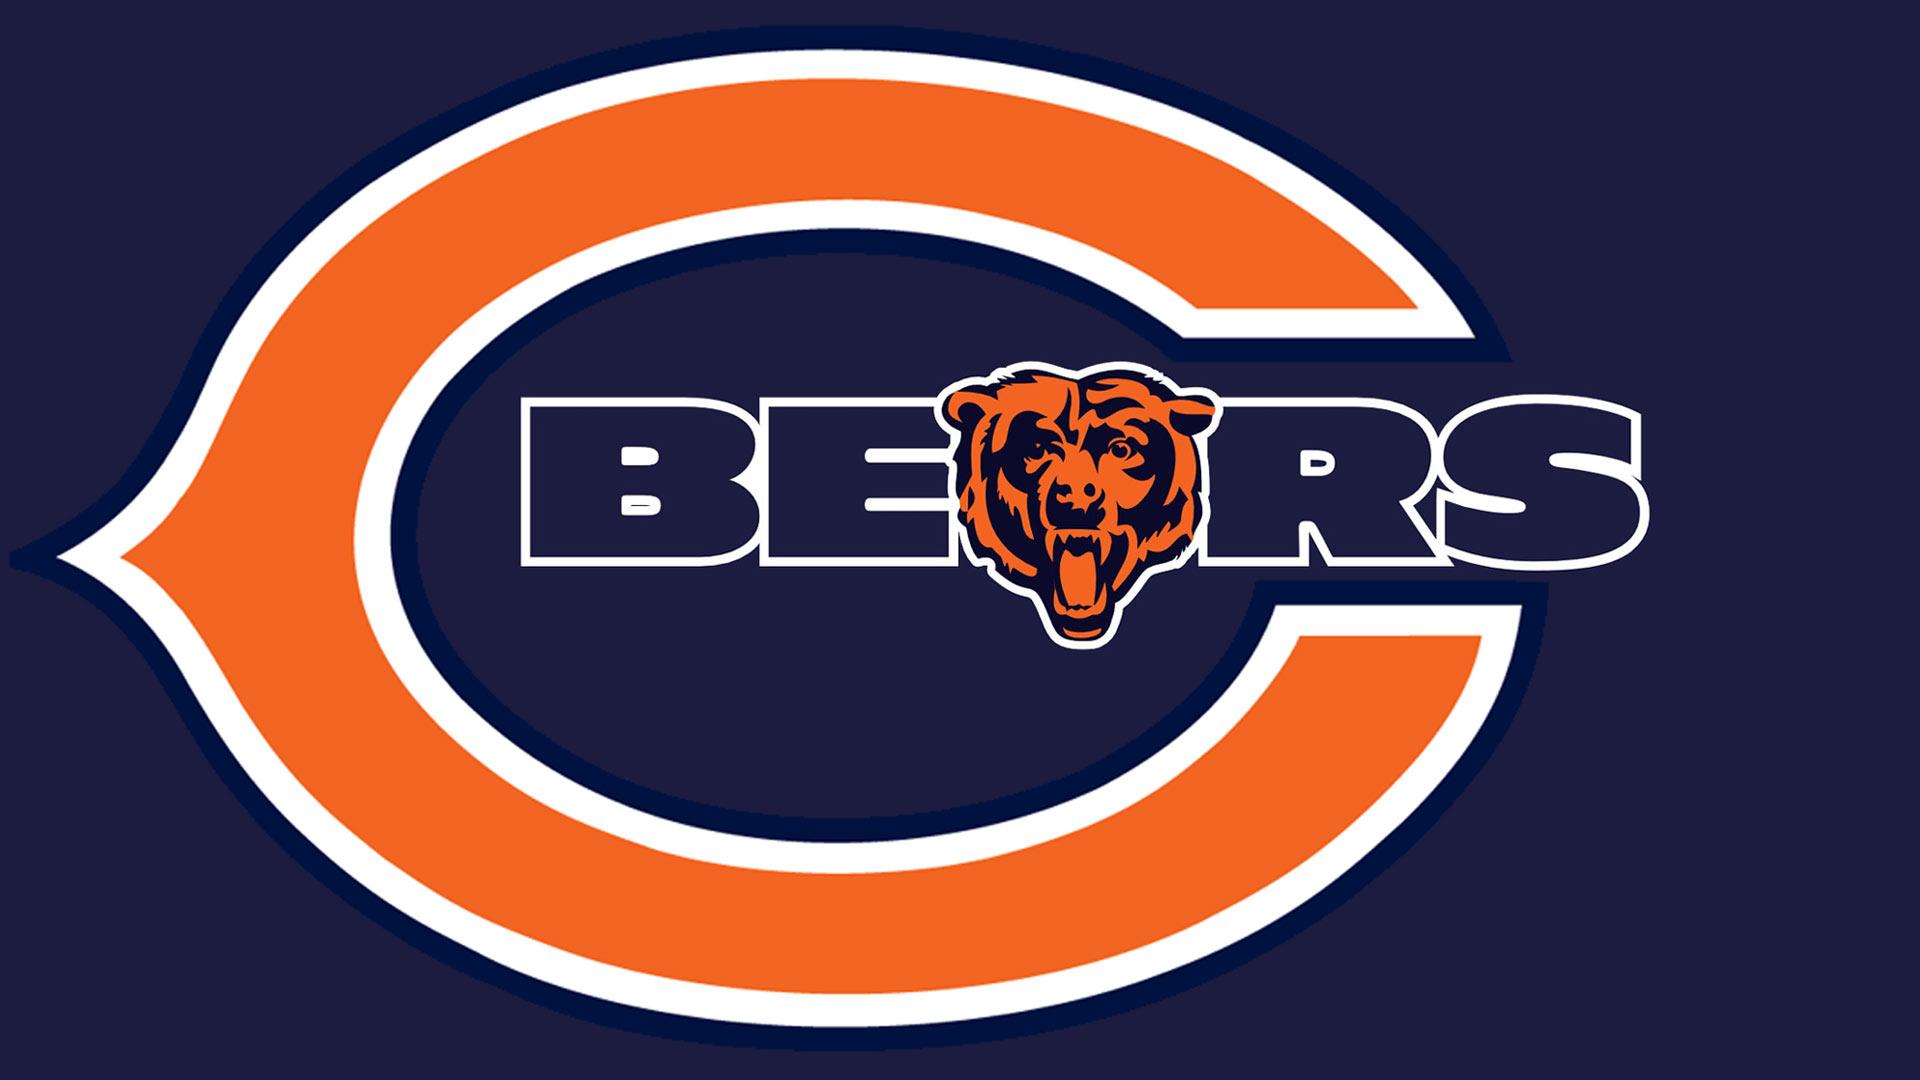 Download Chicago Bears logo Hd 1080p Wallpaper screen size 1920X1080 1920x1080